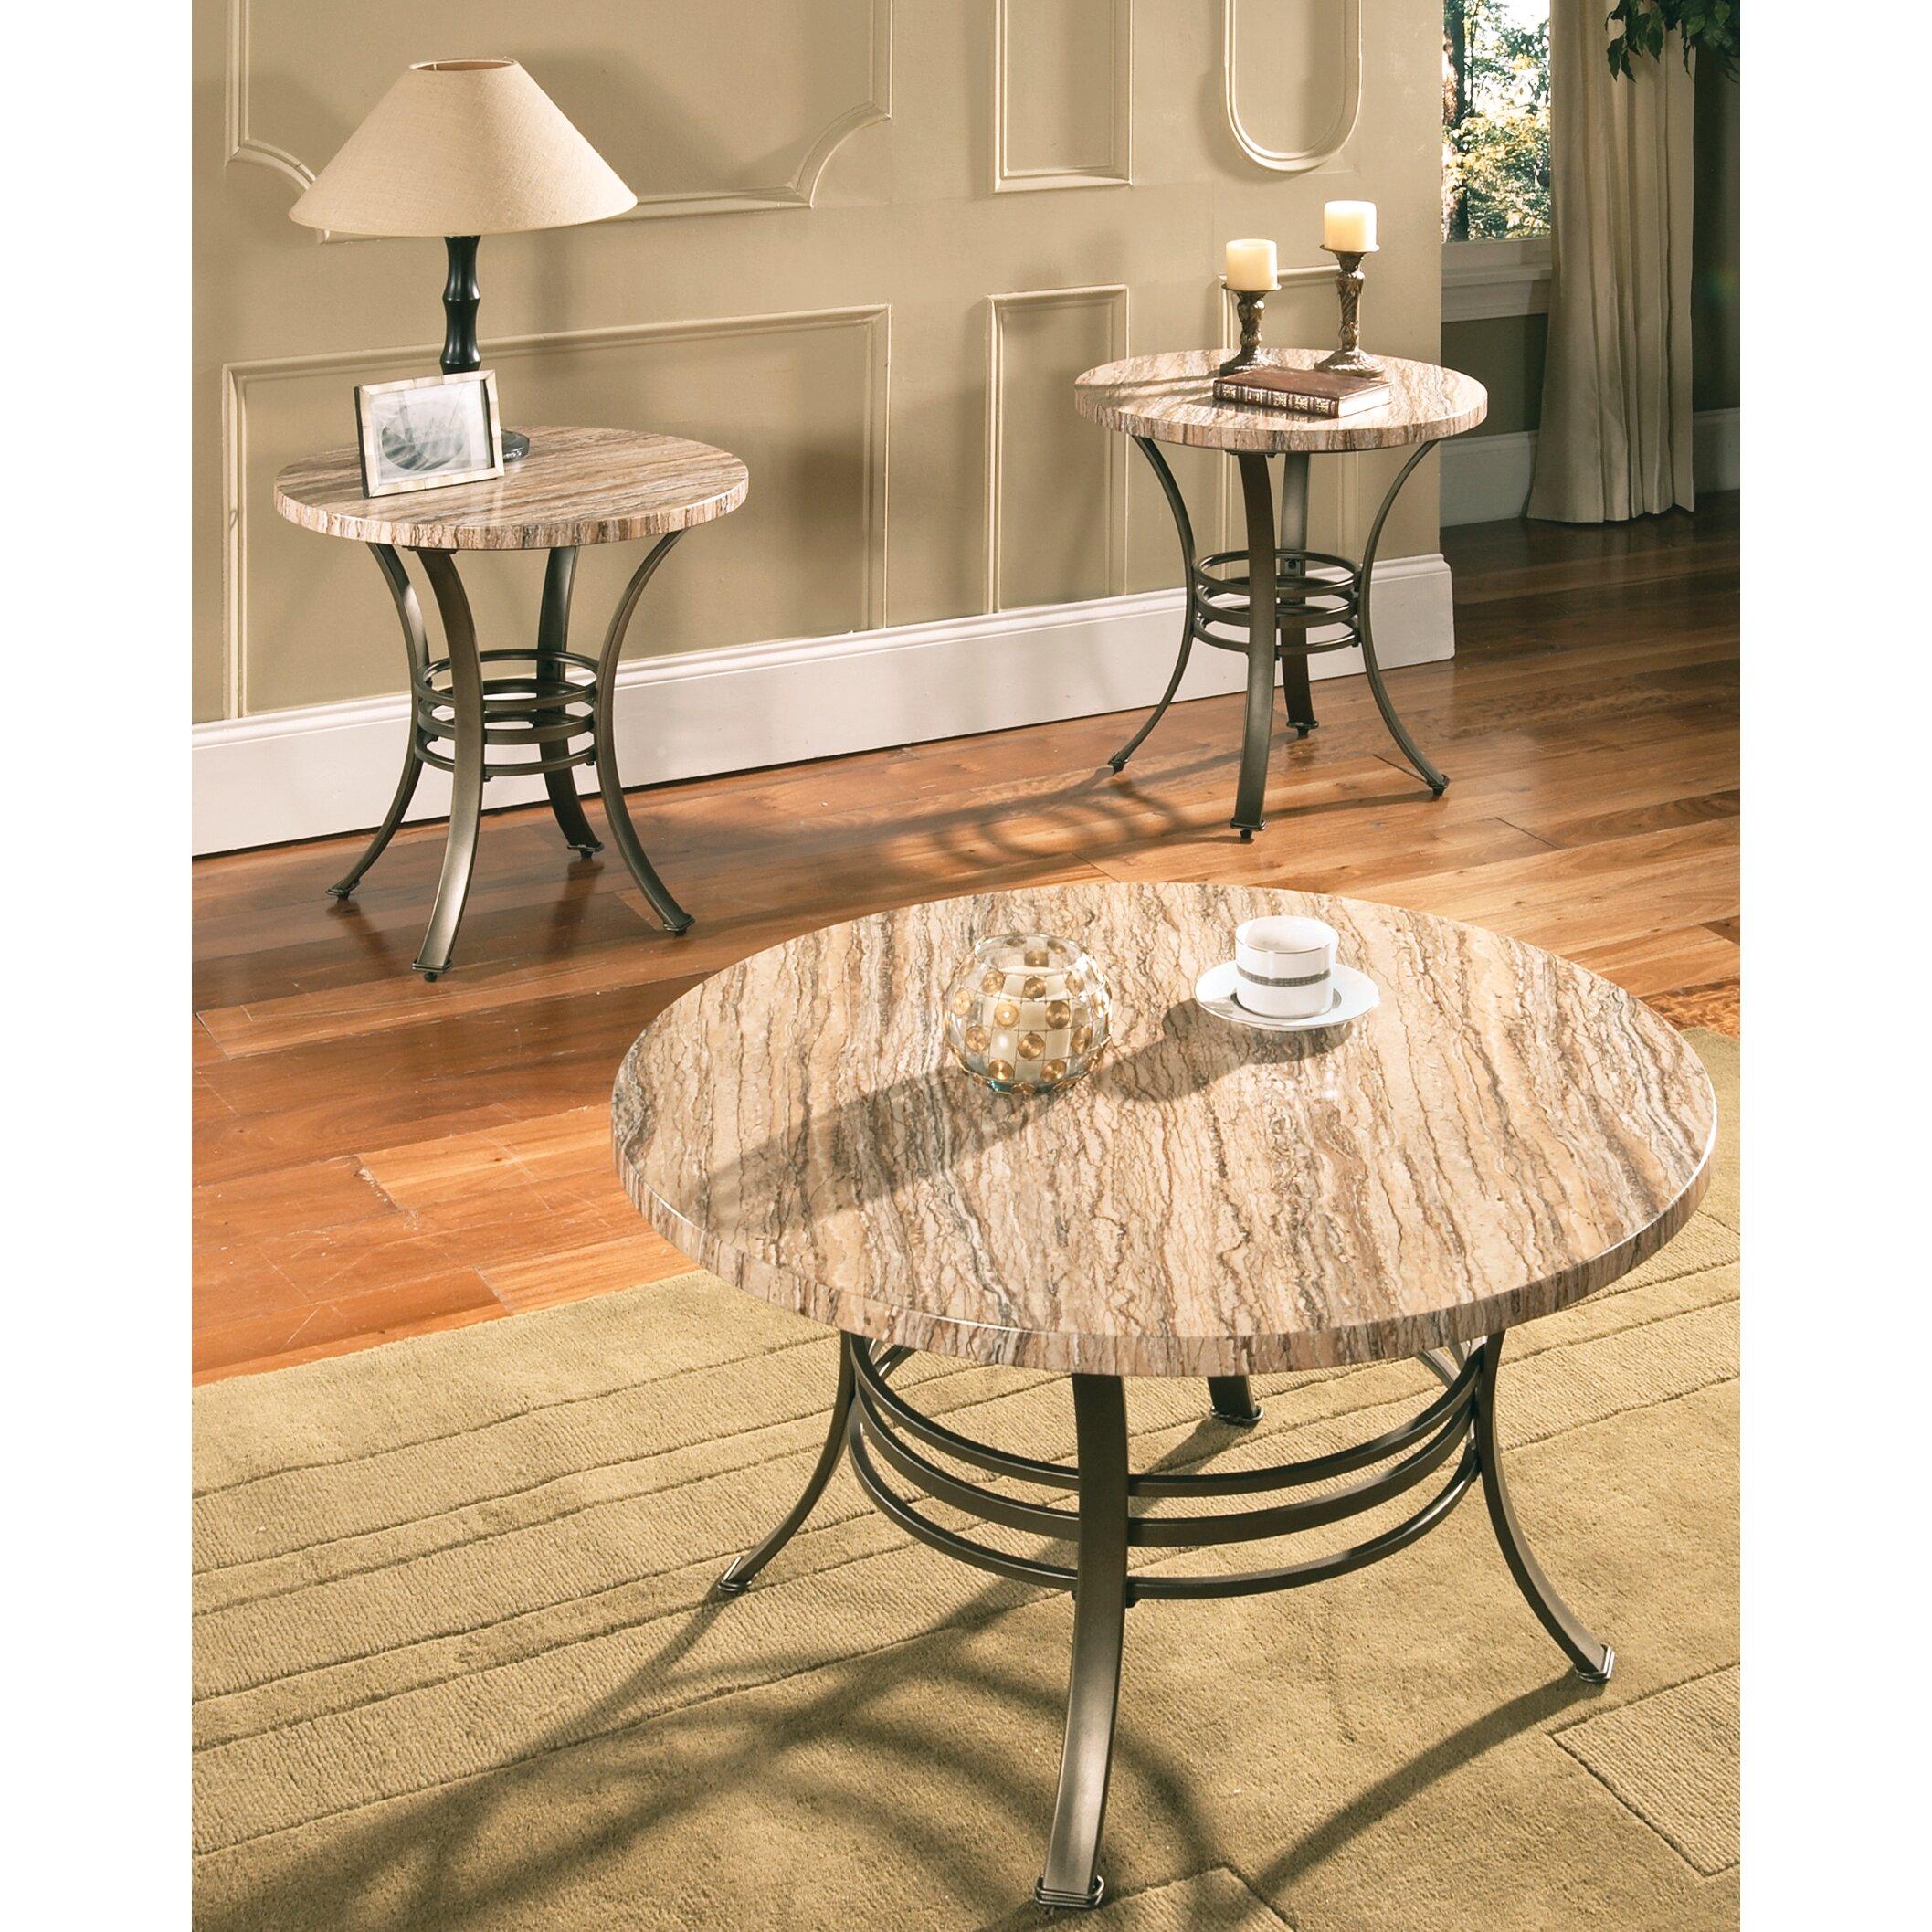 Steve Silver Furniture Ellen Coffee Table Set & Reviews